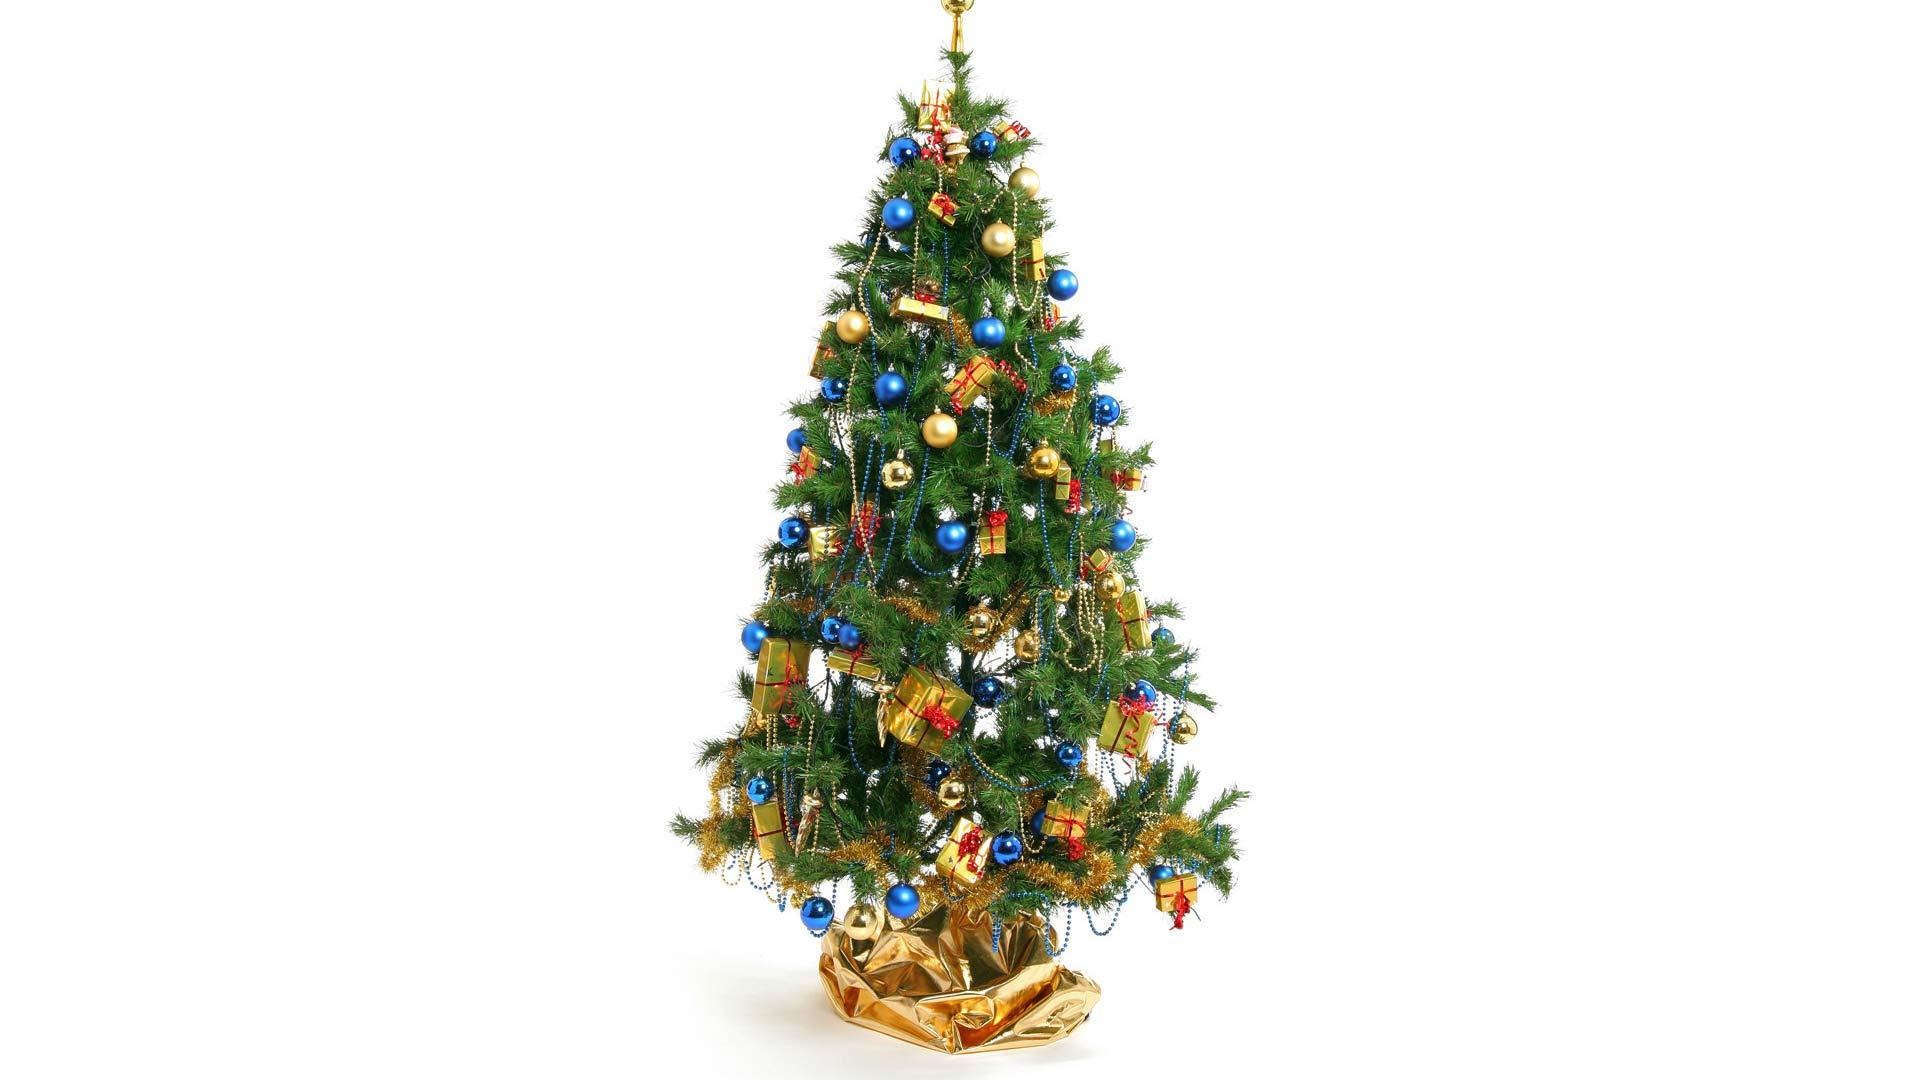 Обои Украшенная елка, картинки - Обои для рабочего стола ...: http://www.fullhdoboi.ru/photo/holidays/ukrashennaja_elka/24-0-21281